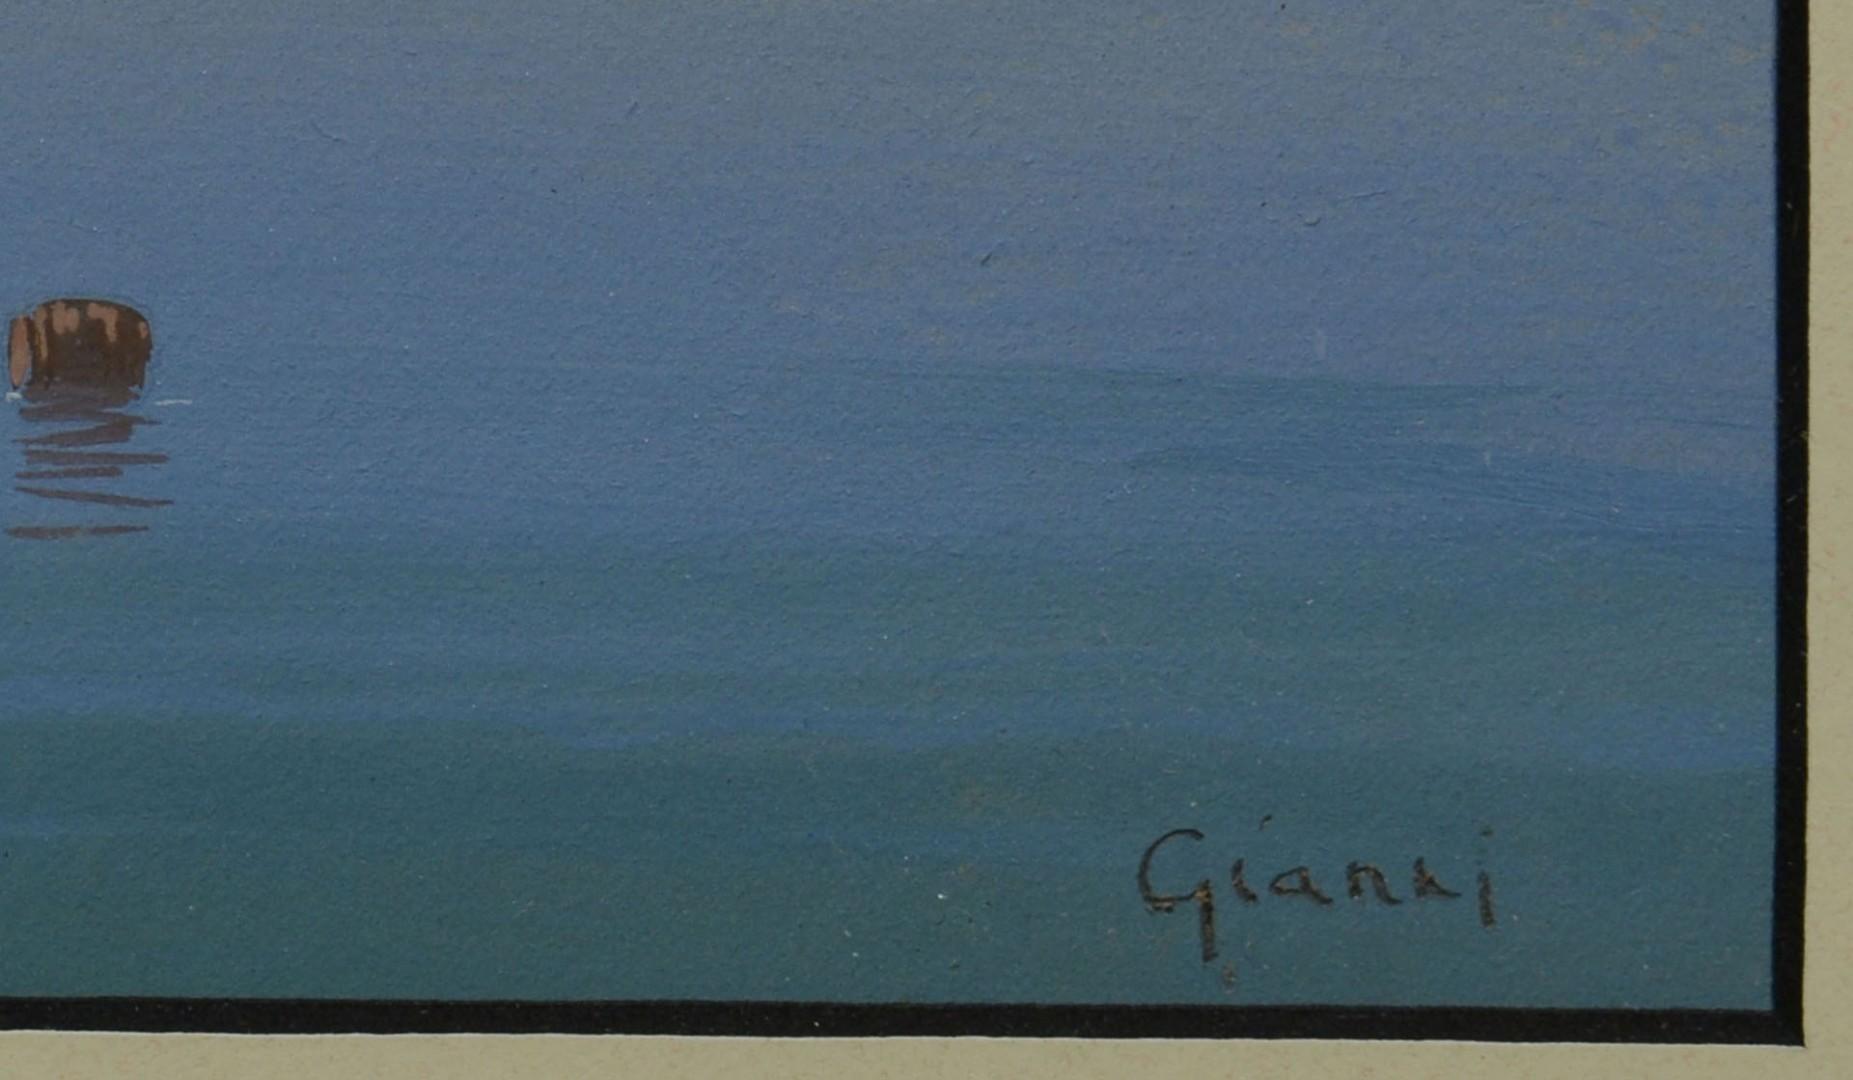 Lot 200: Italian School Seascape Watercolor, signed Gianni